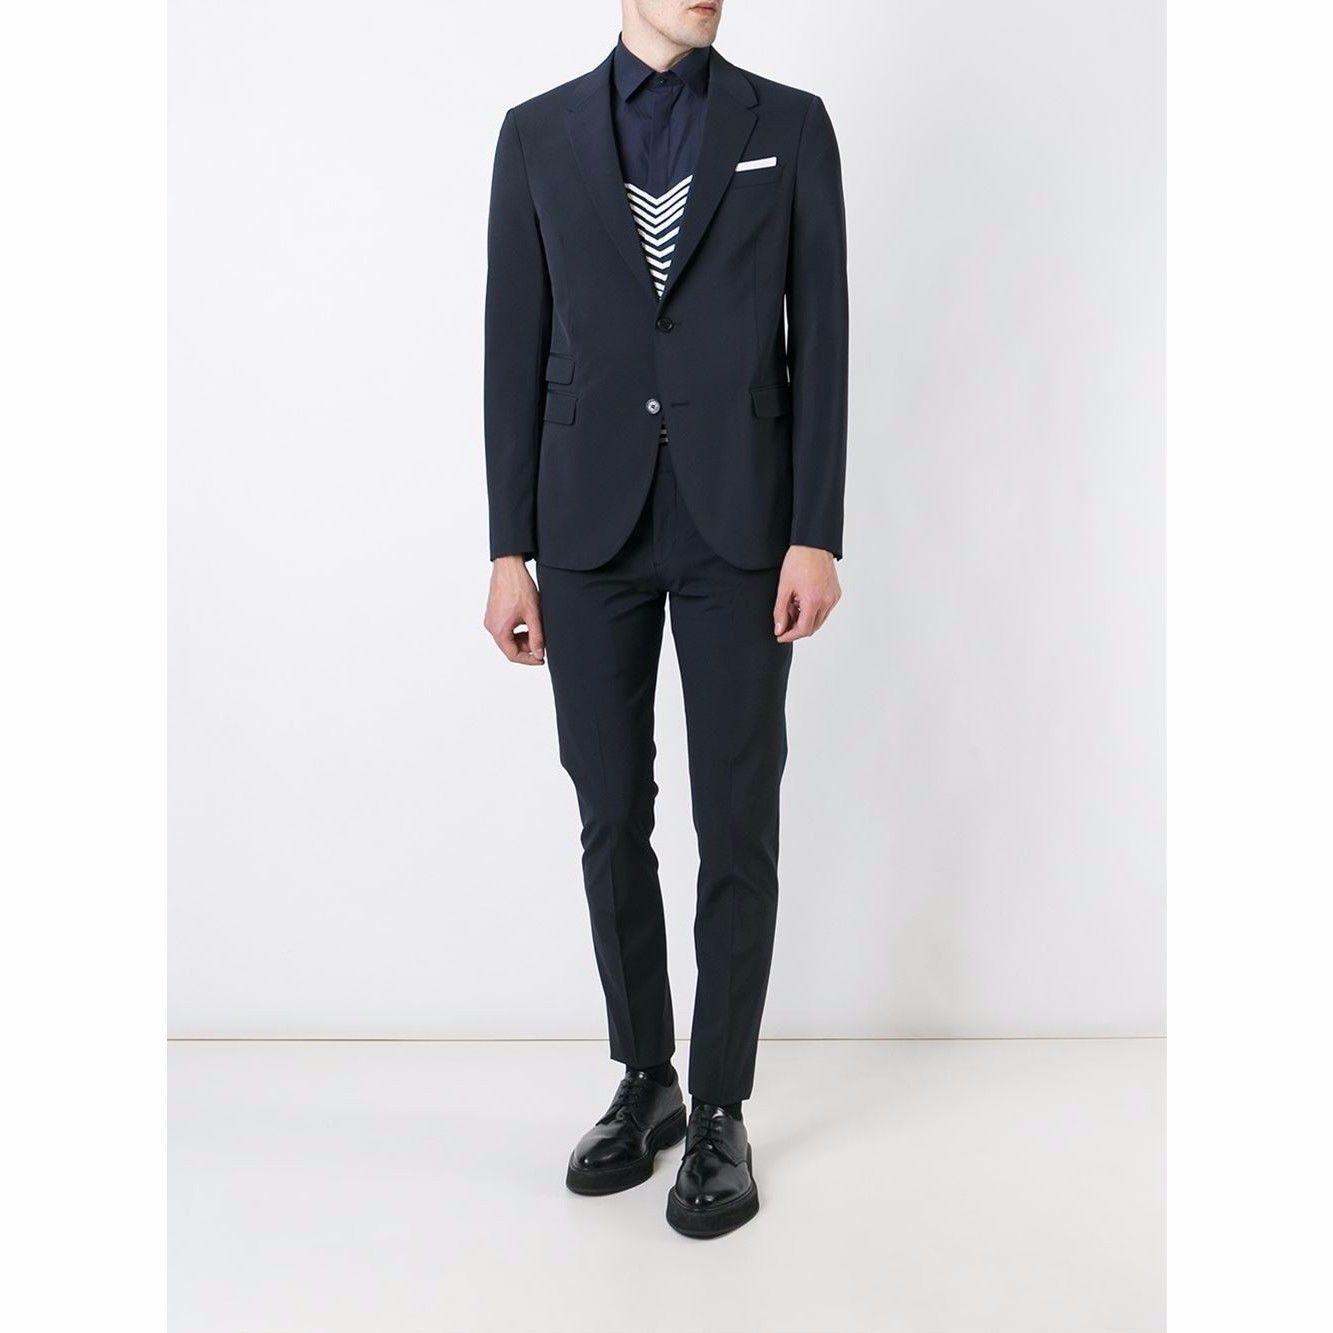 Neil Barrett - ニールバレット /2Piece Formal Suit  (Navy) 2ピースフォーマルスーツ ネイビー